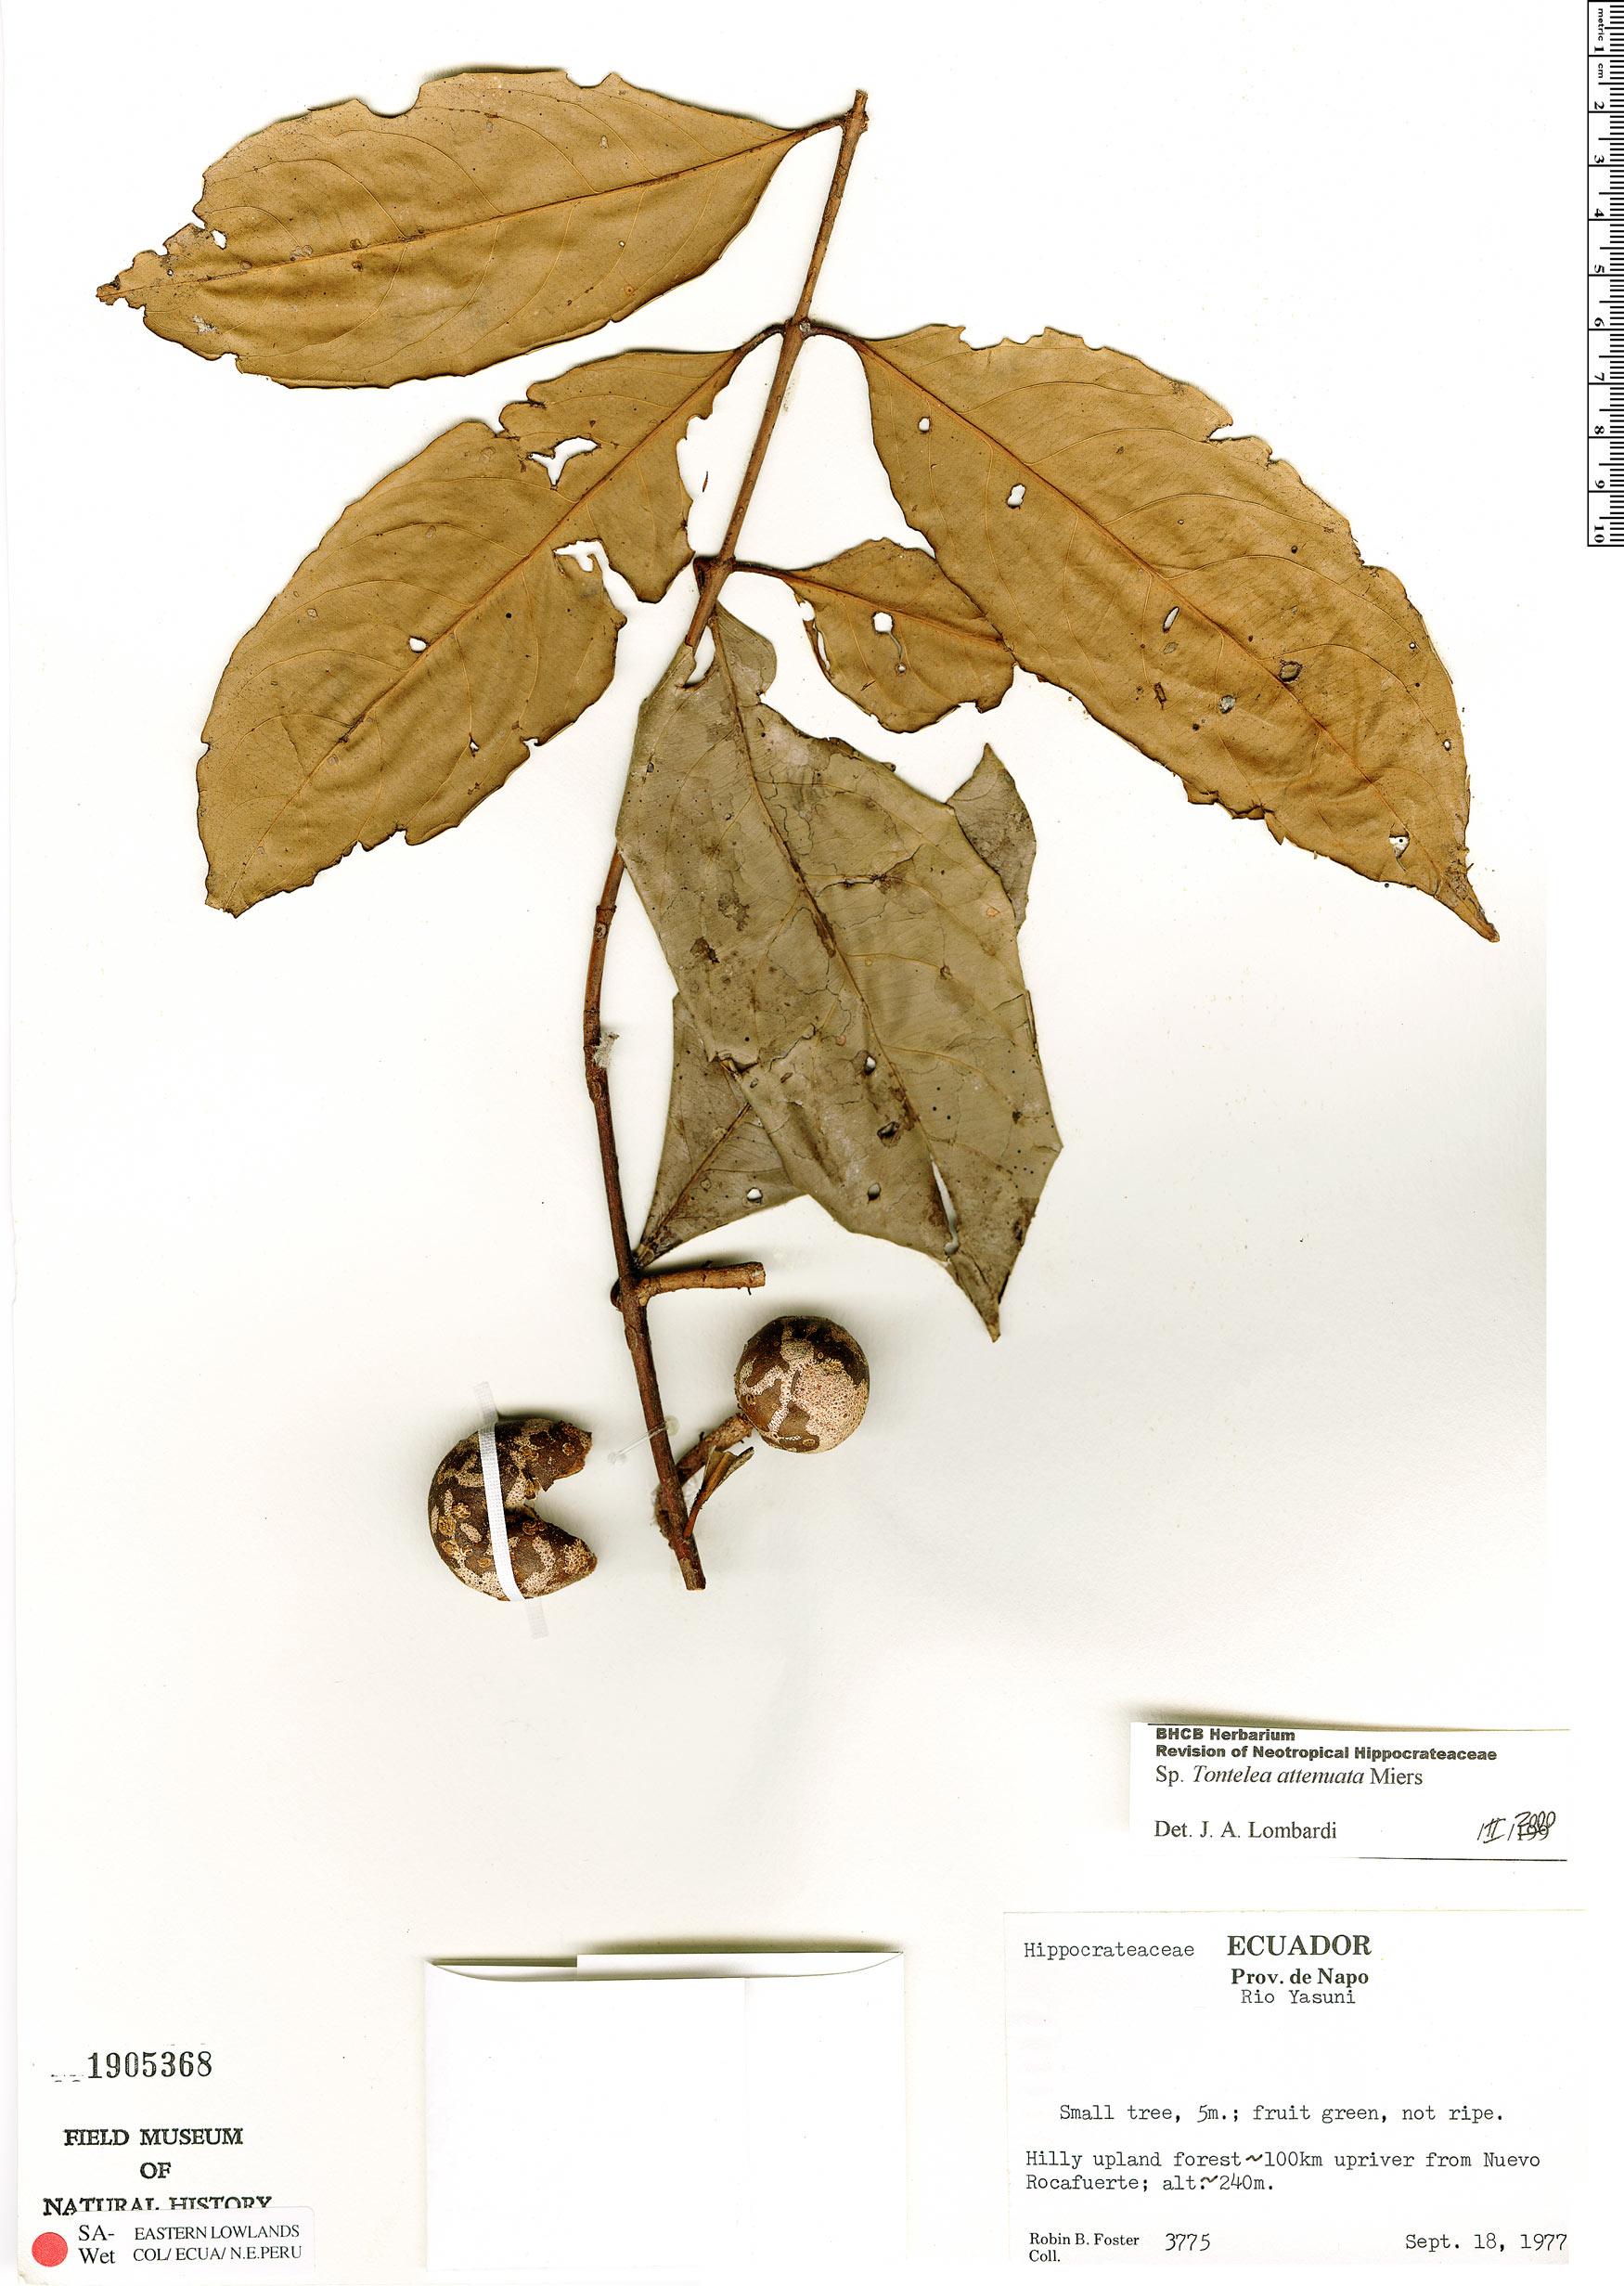 Specimen: Tontelea attenuata